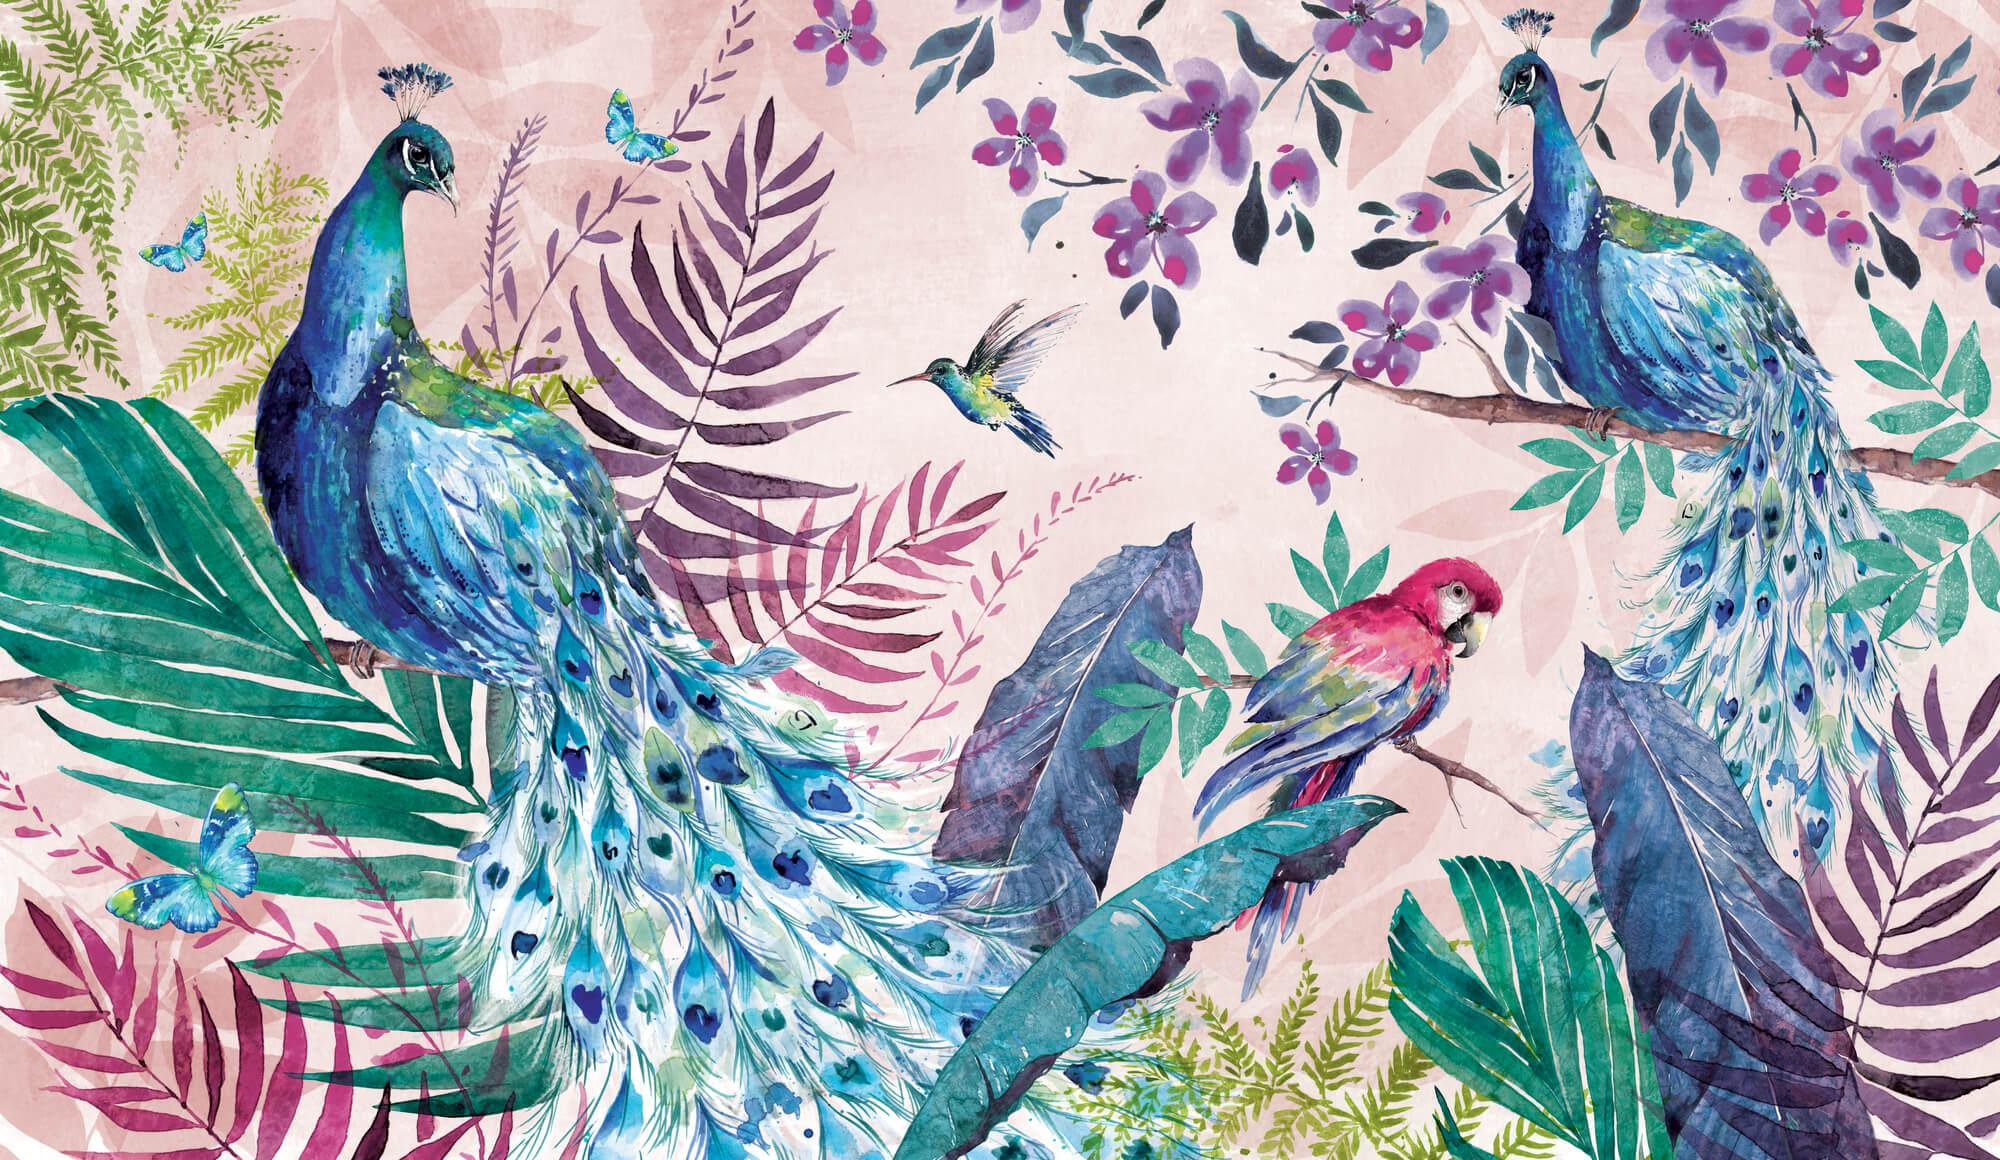 Tropical Peacock Wall Mural By Di Brookes